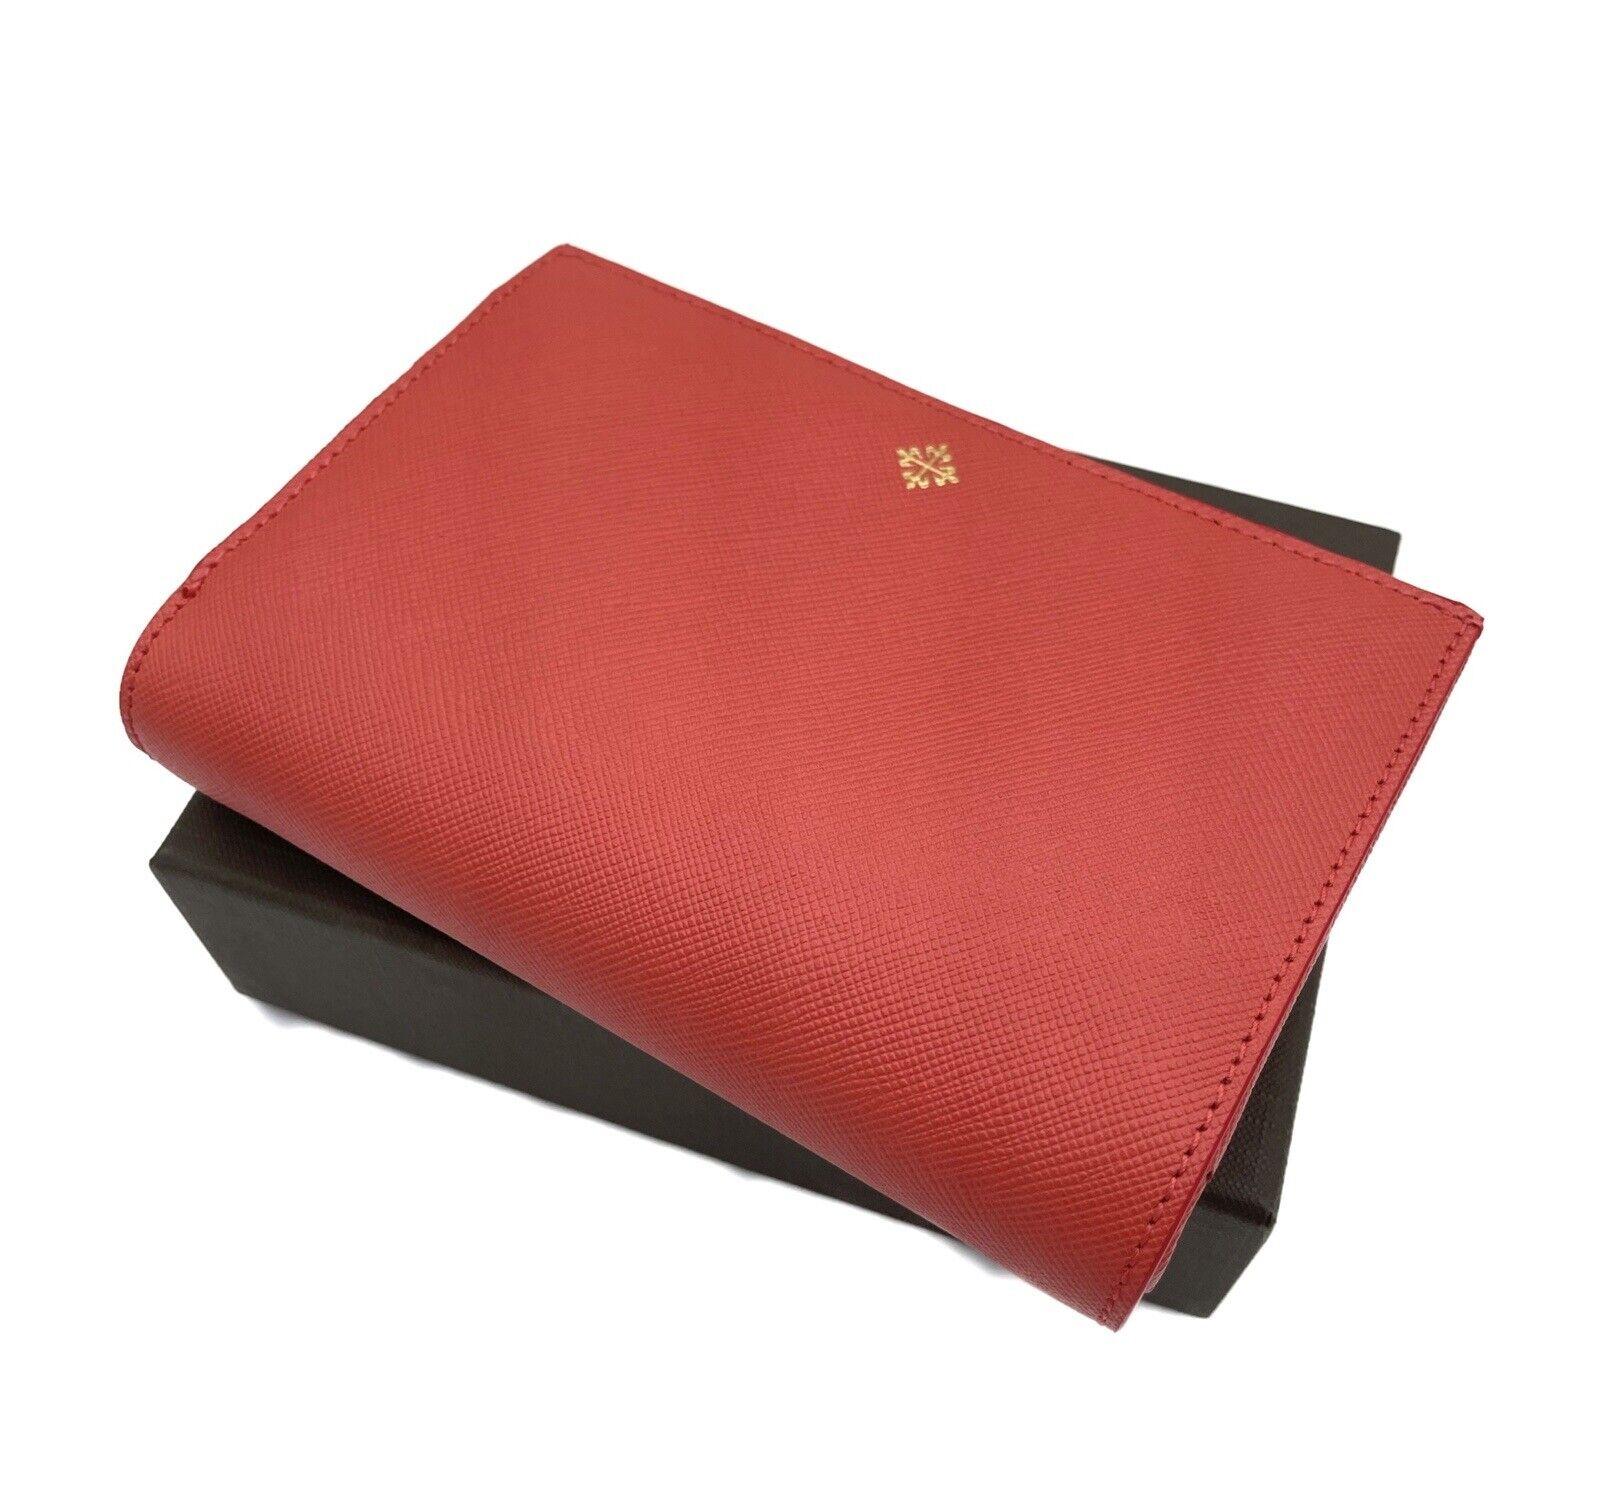 Patek Philippe Leather Wallet SALMON WALLET NEW ORIGINAL PERFECT